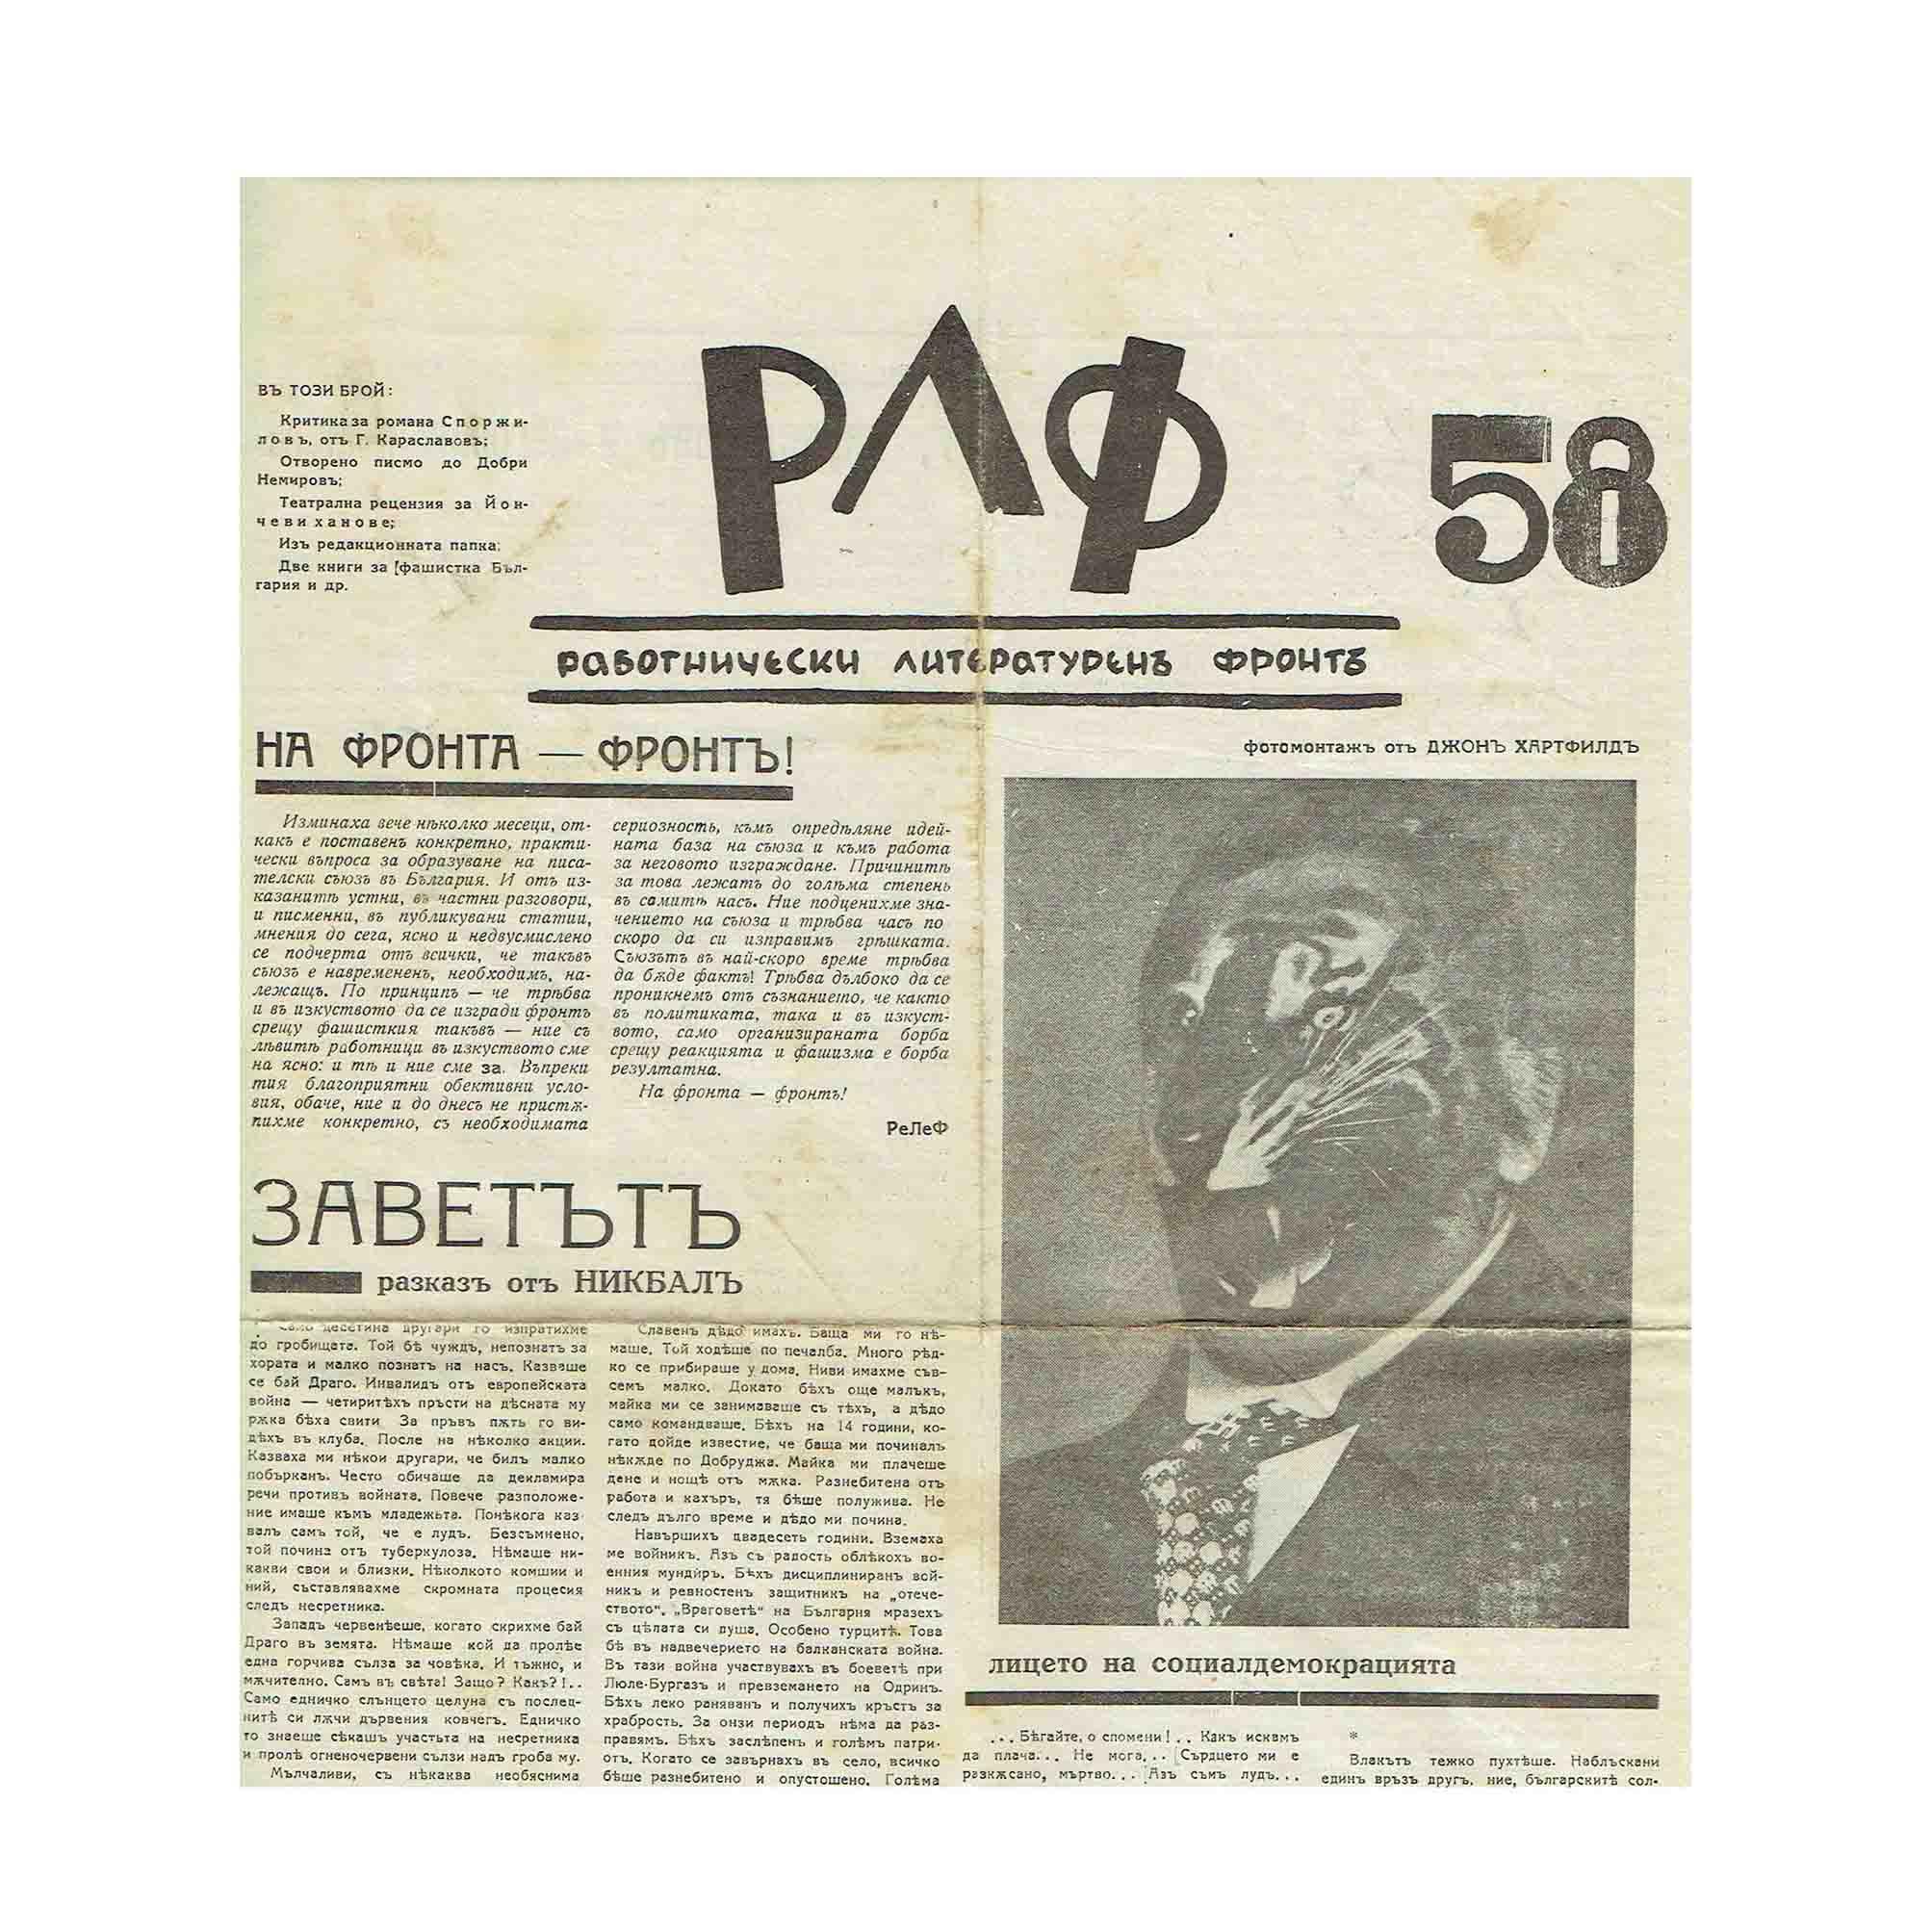 6079 Relef 2 58 1931 Heartfield Titelblatt A N